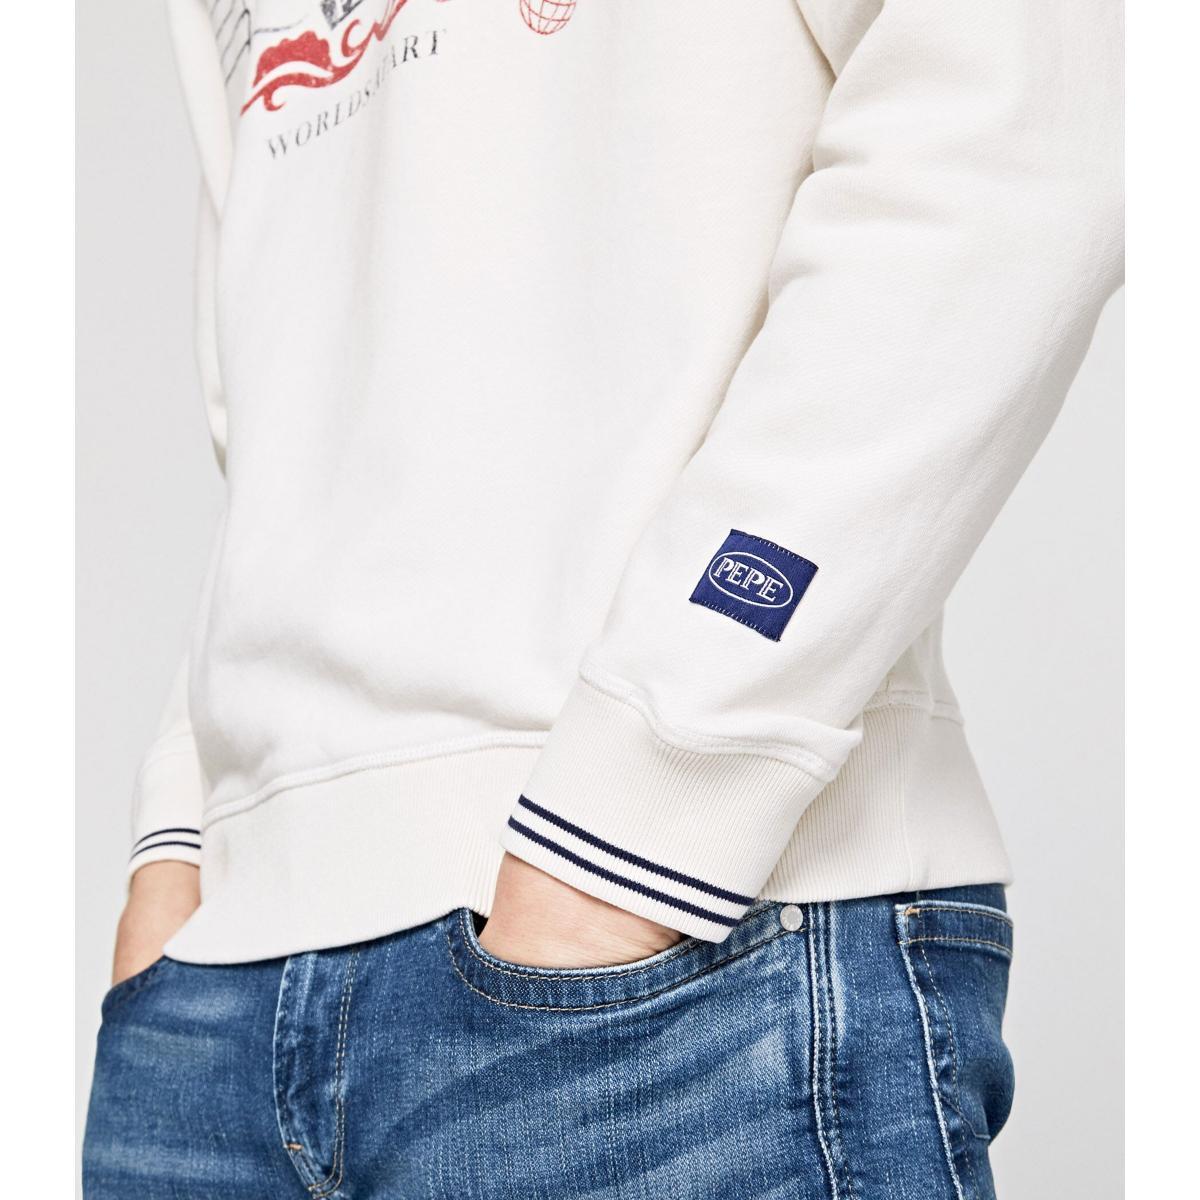 Felpa Pepe Jeans con stampa girocollo da uomo rif. PM581634 SHAAN